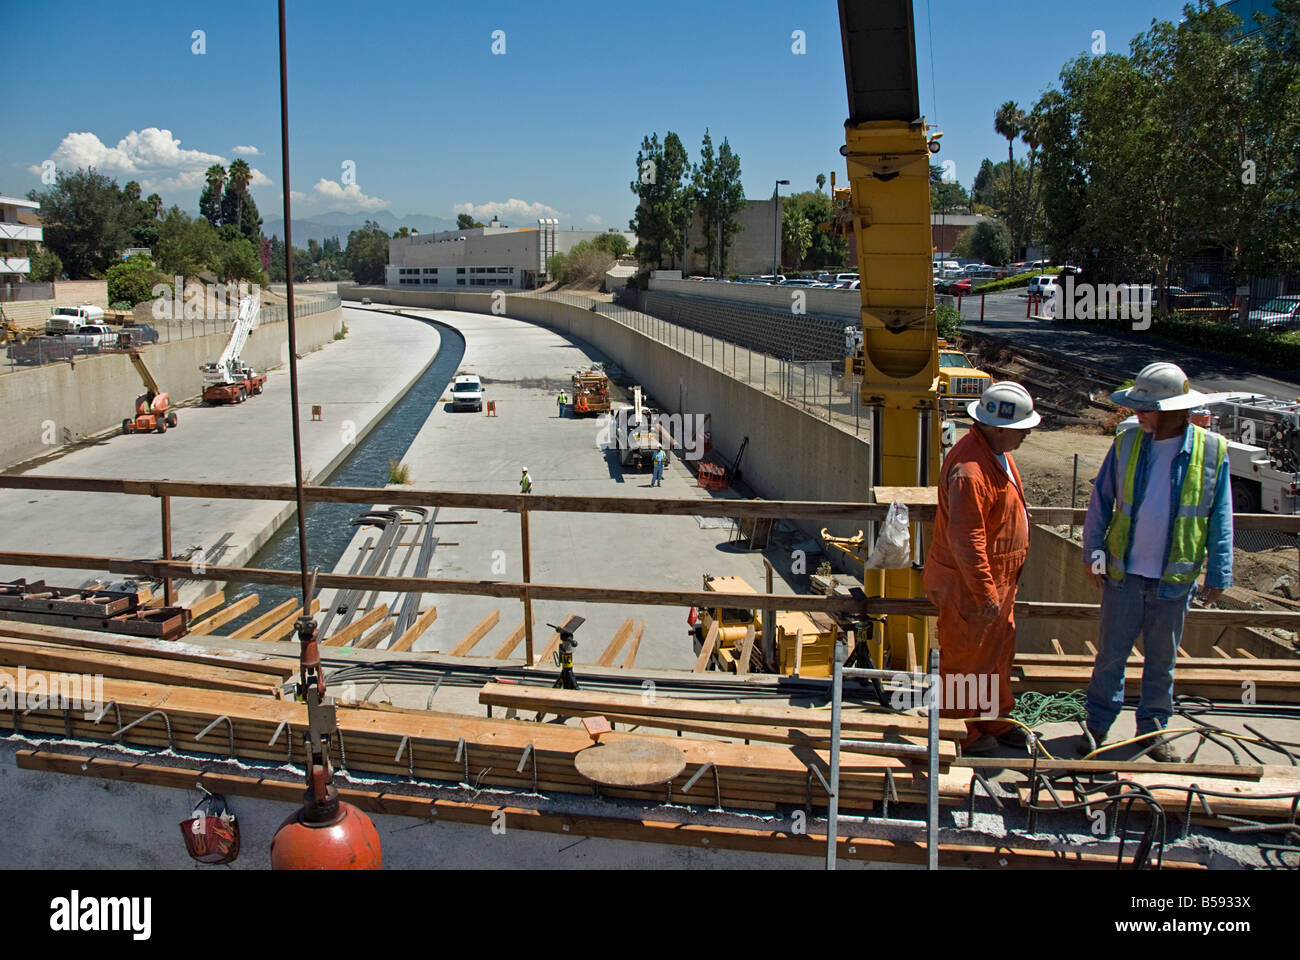 Los Angeles City Public Works Department